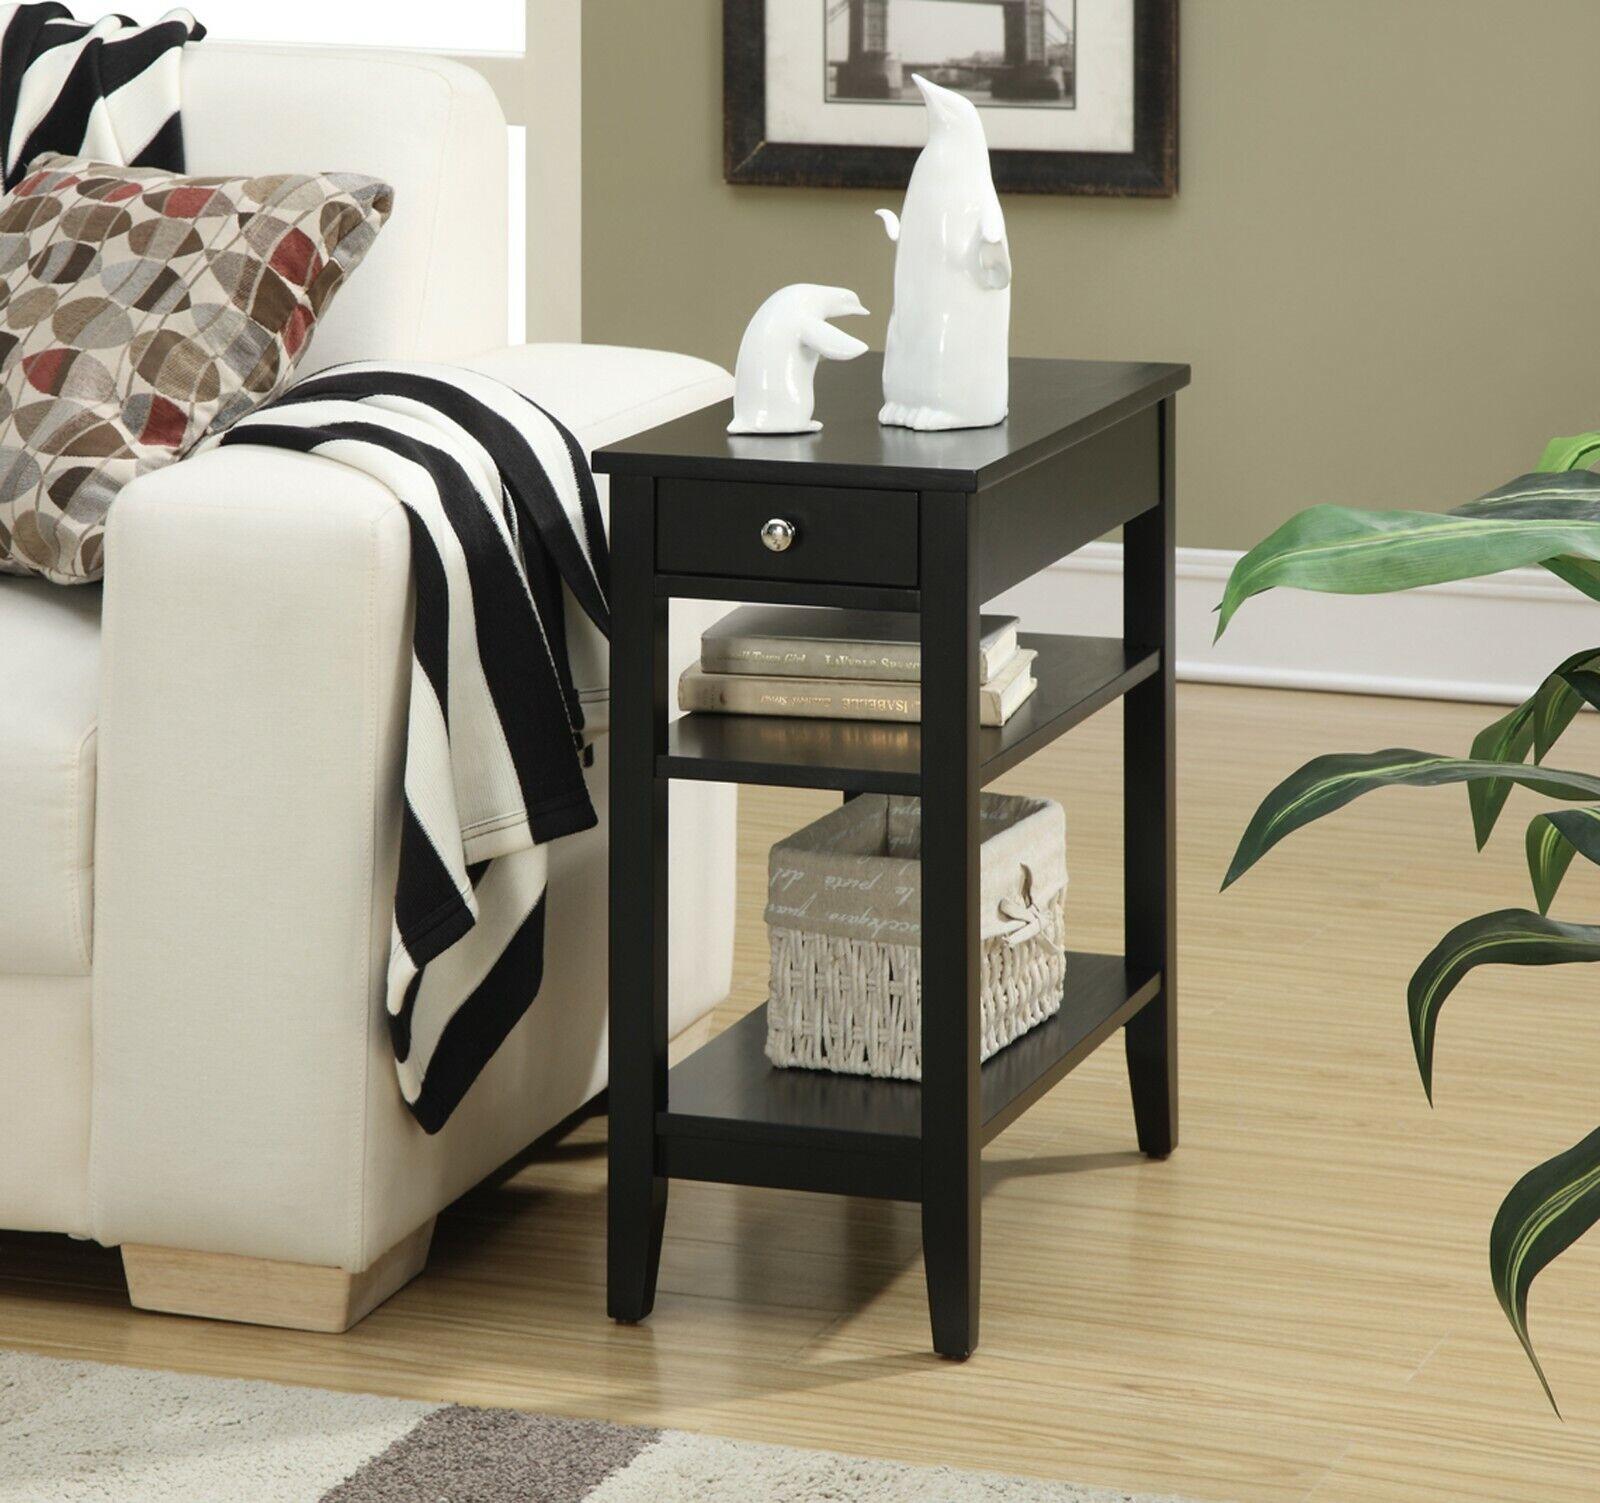 end table nightstand bedside drawer furniture cabinet